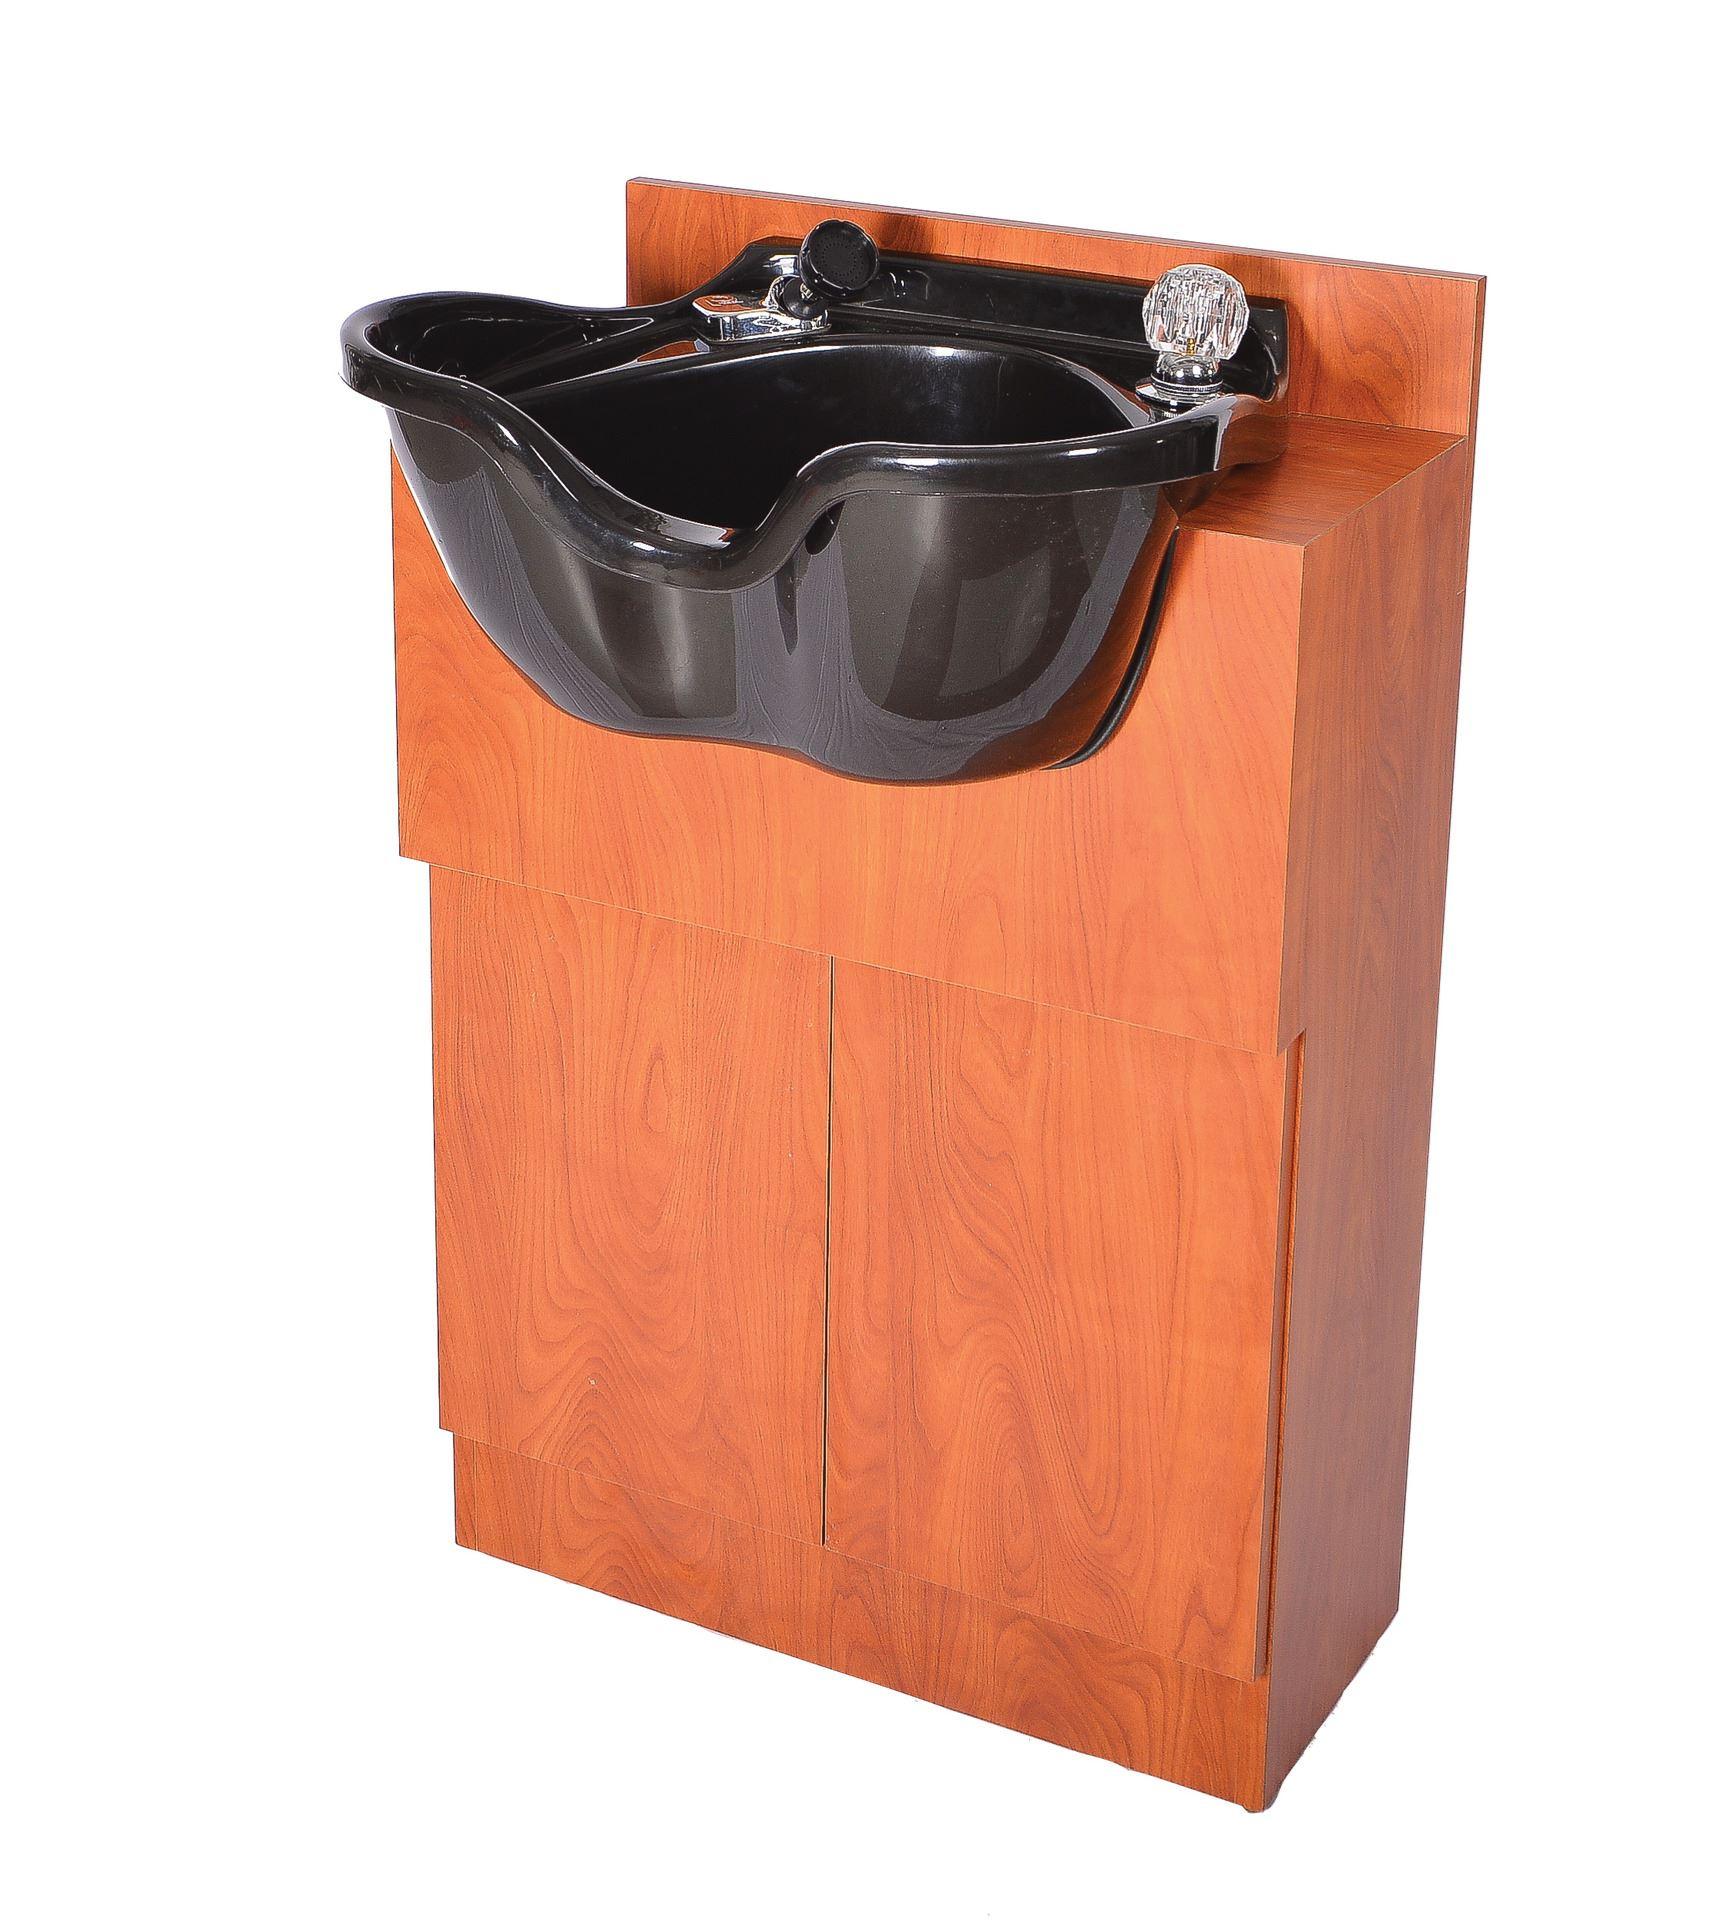 Superieur Pibbs PB48 Shampoo Cabinet For 5310 Shampoo Bowl + Free Shipping!